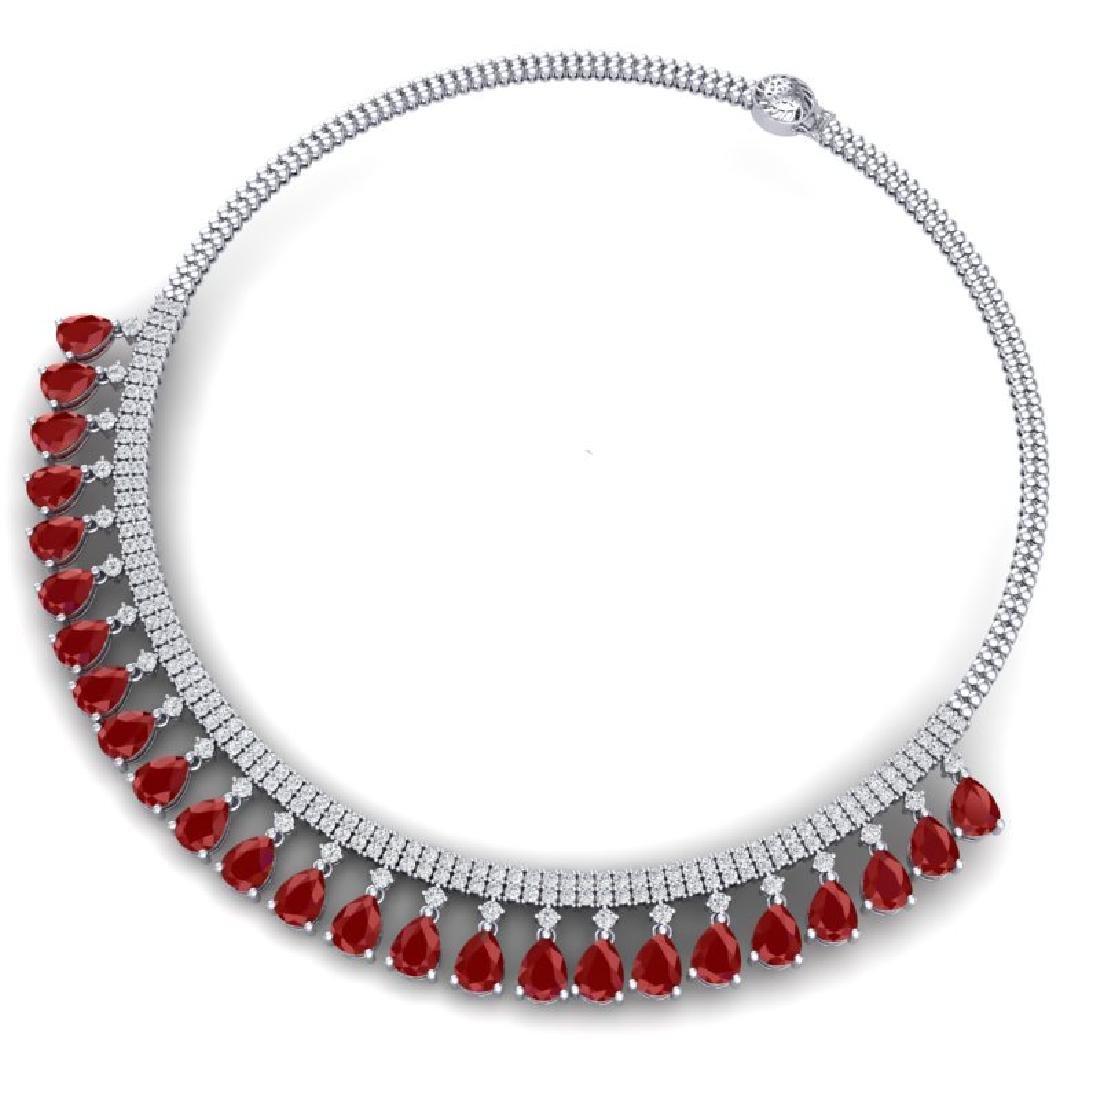 51.75 CTW Royalty Ruby & VS Diamond Necklace 18K White - 3